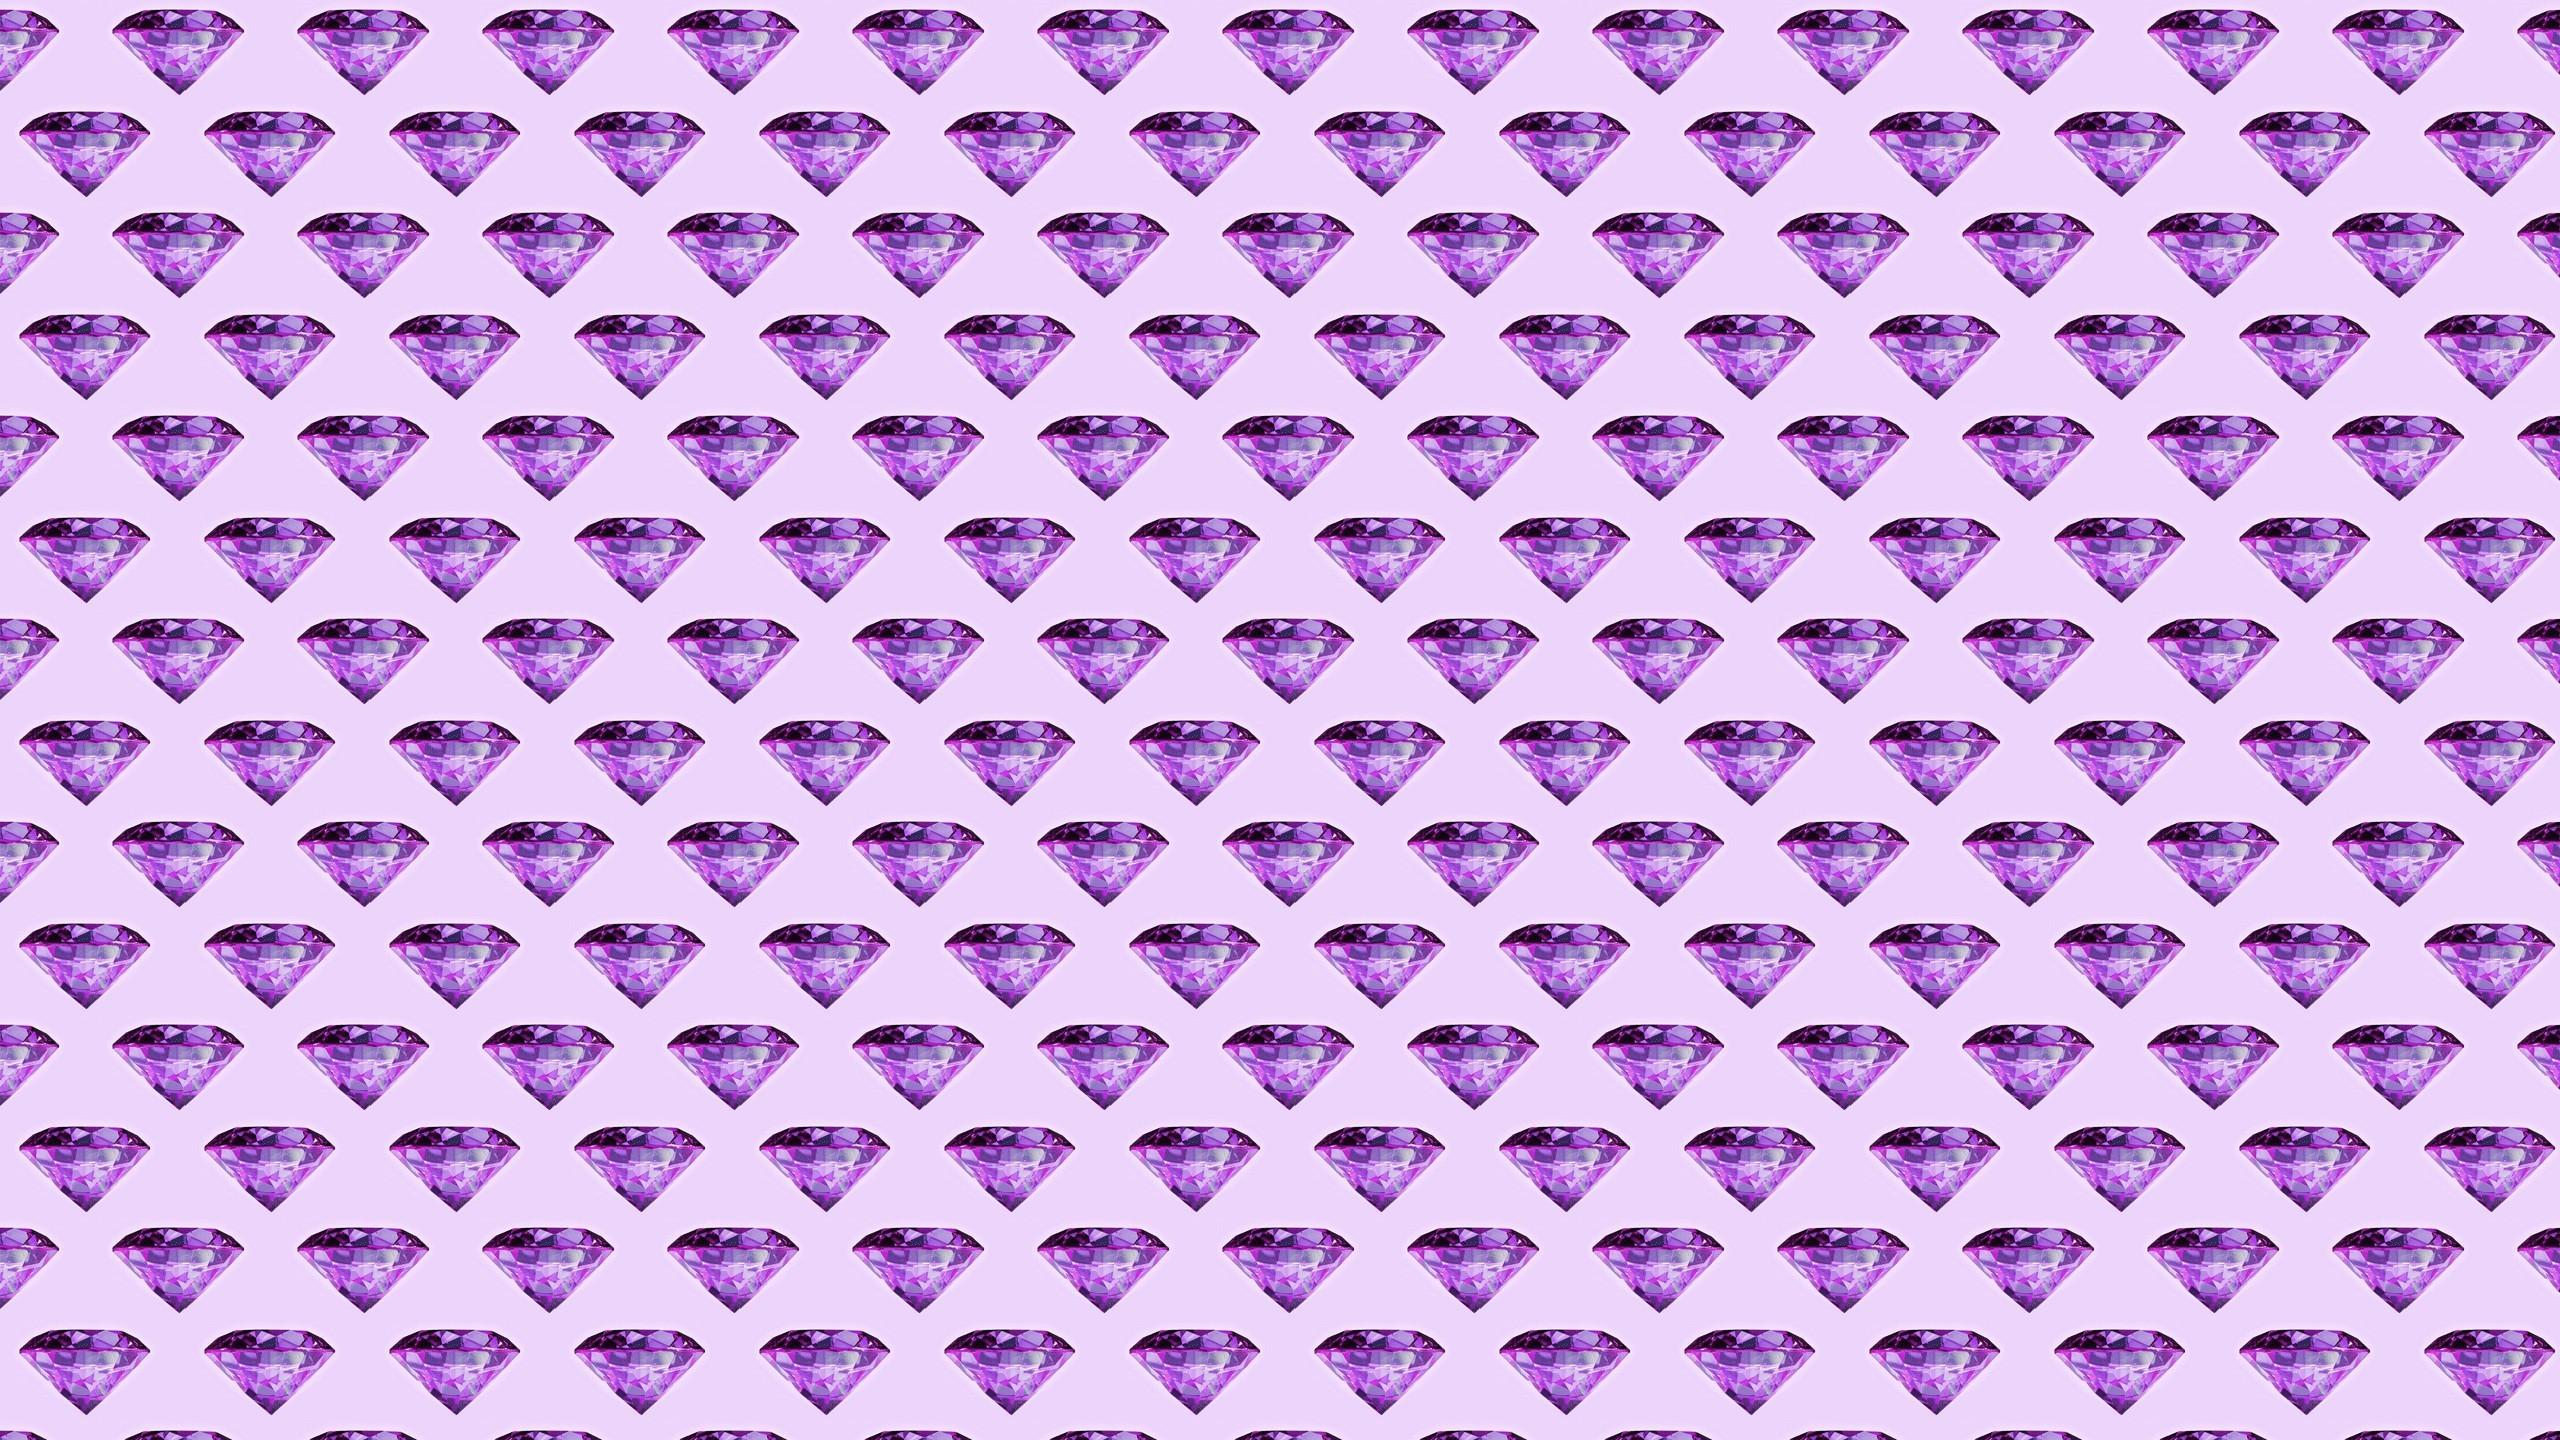 tumblr purple backgrounds 67